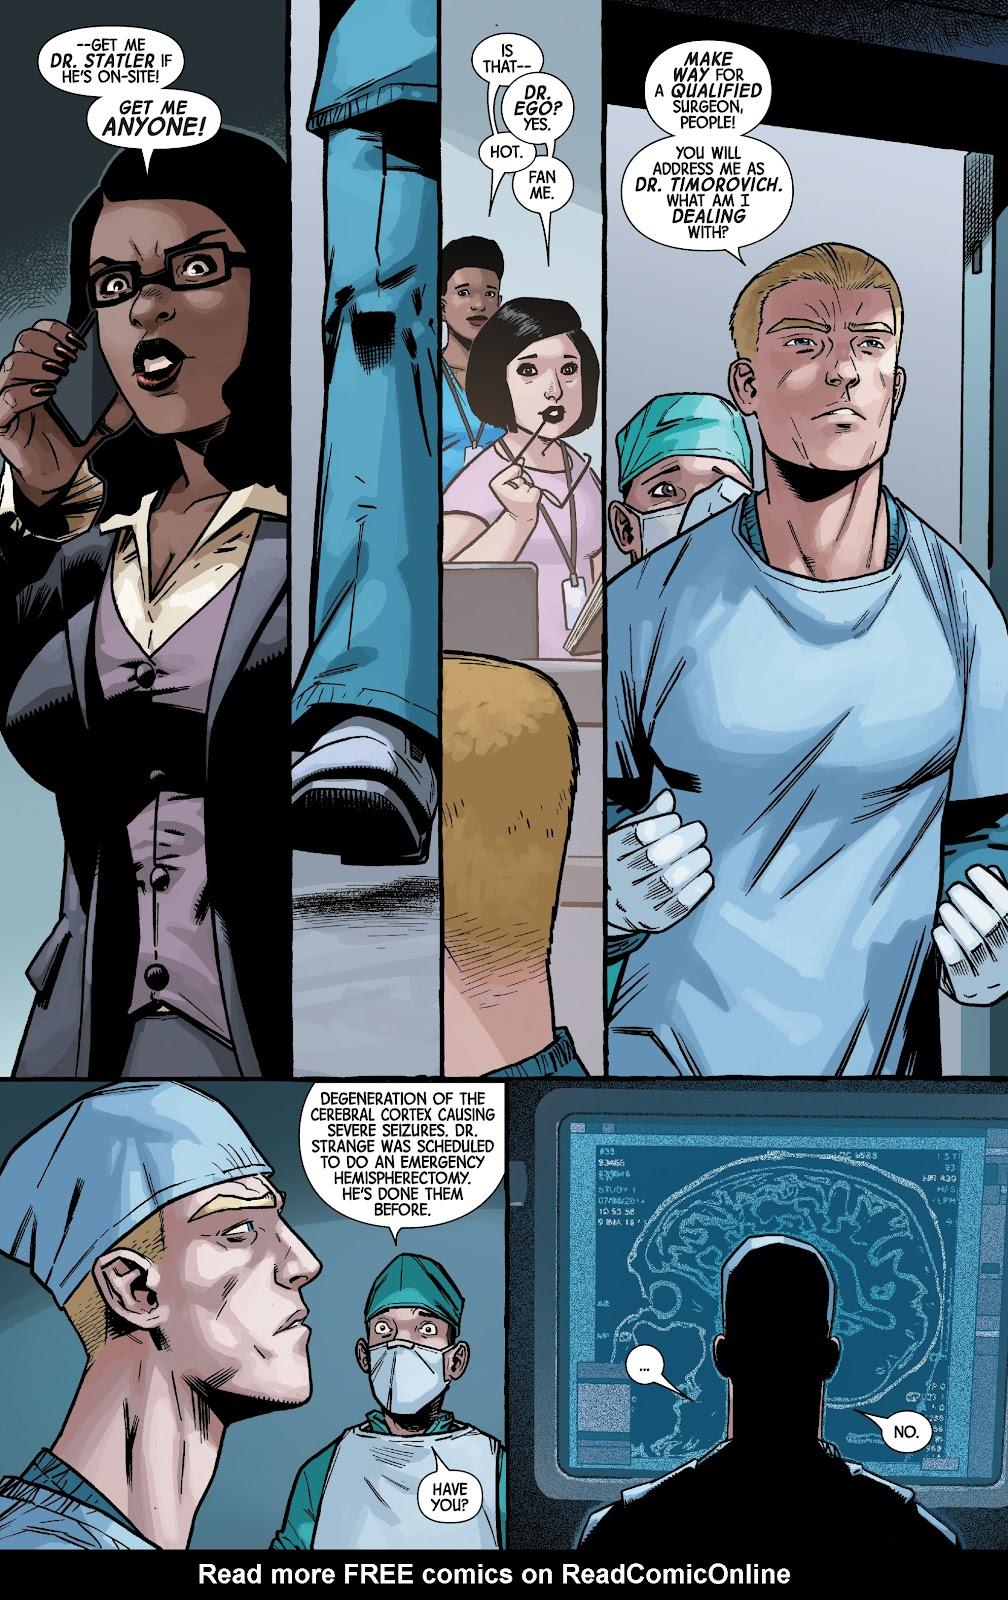 Read online Dr. Strange comic -  Issue #4 - 6